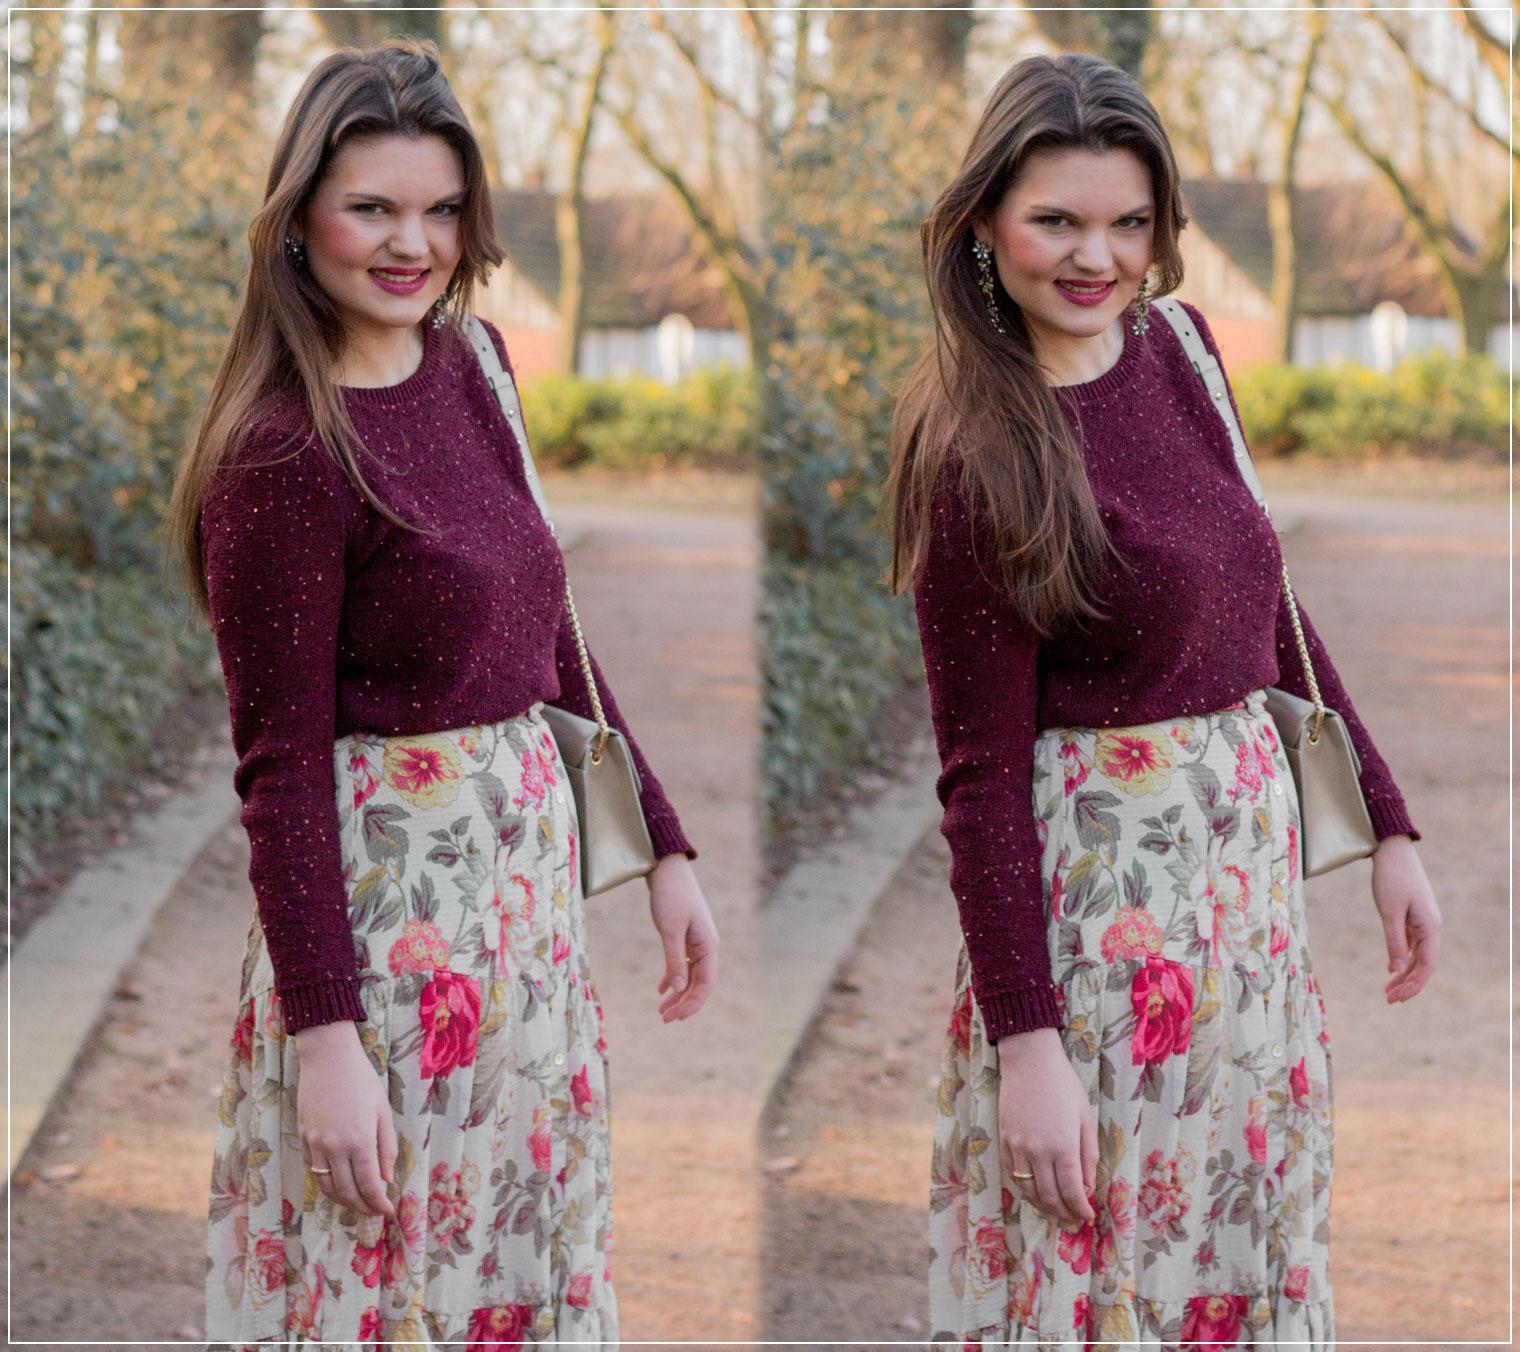 Modetrend, Strick im Frühling kombinieren, Blumenmuster, Maxirock, Vintagelook, Fruehlingslook, Spring Style, Outfitinspiration, Modebloggerin, Fashionbloggerin, Modeblog, Ruhrgebiet